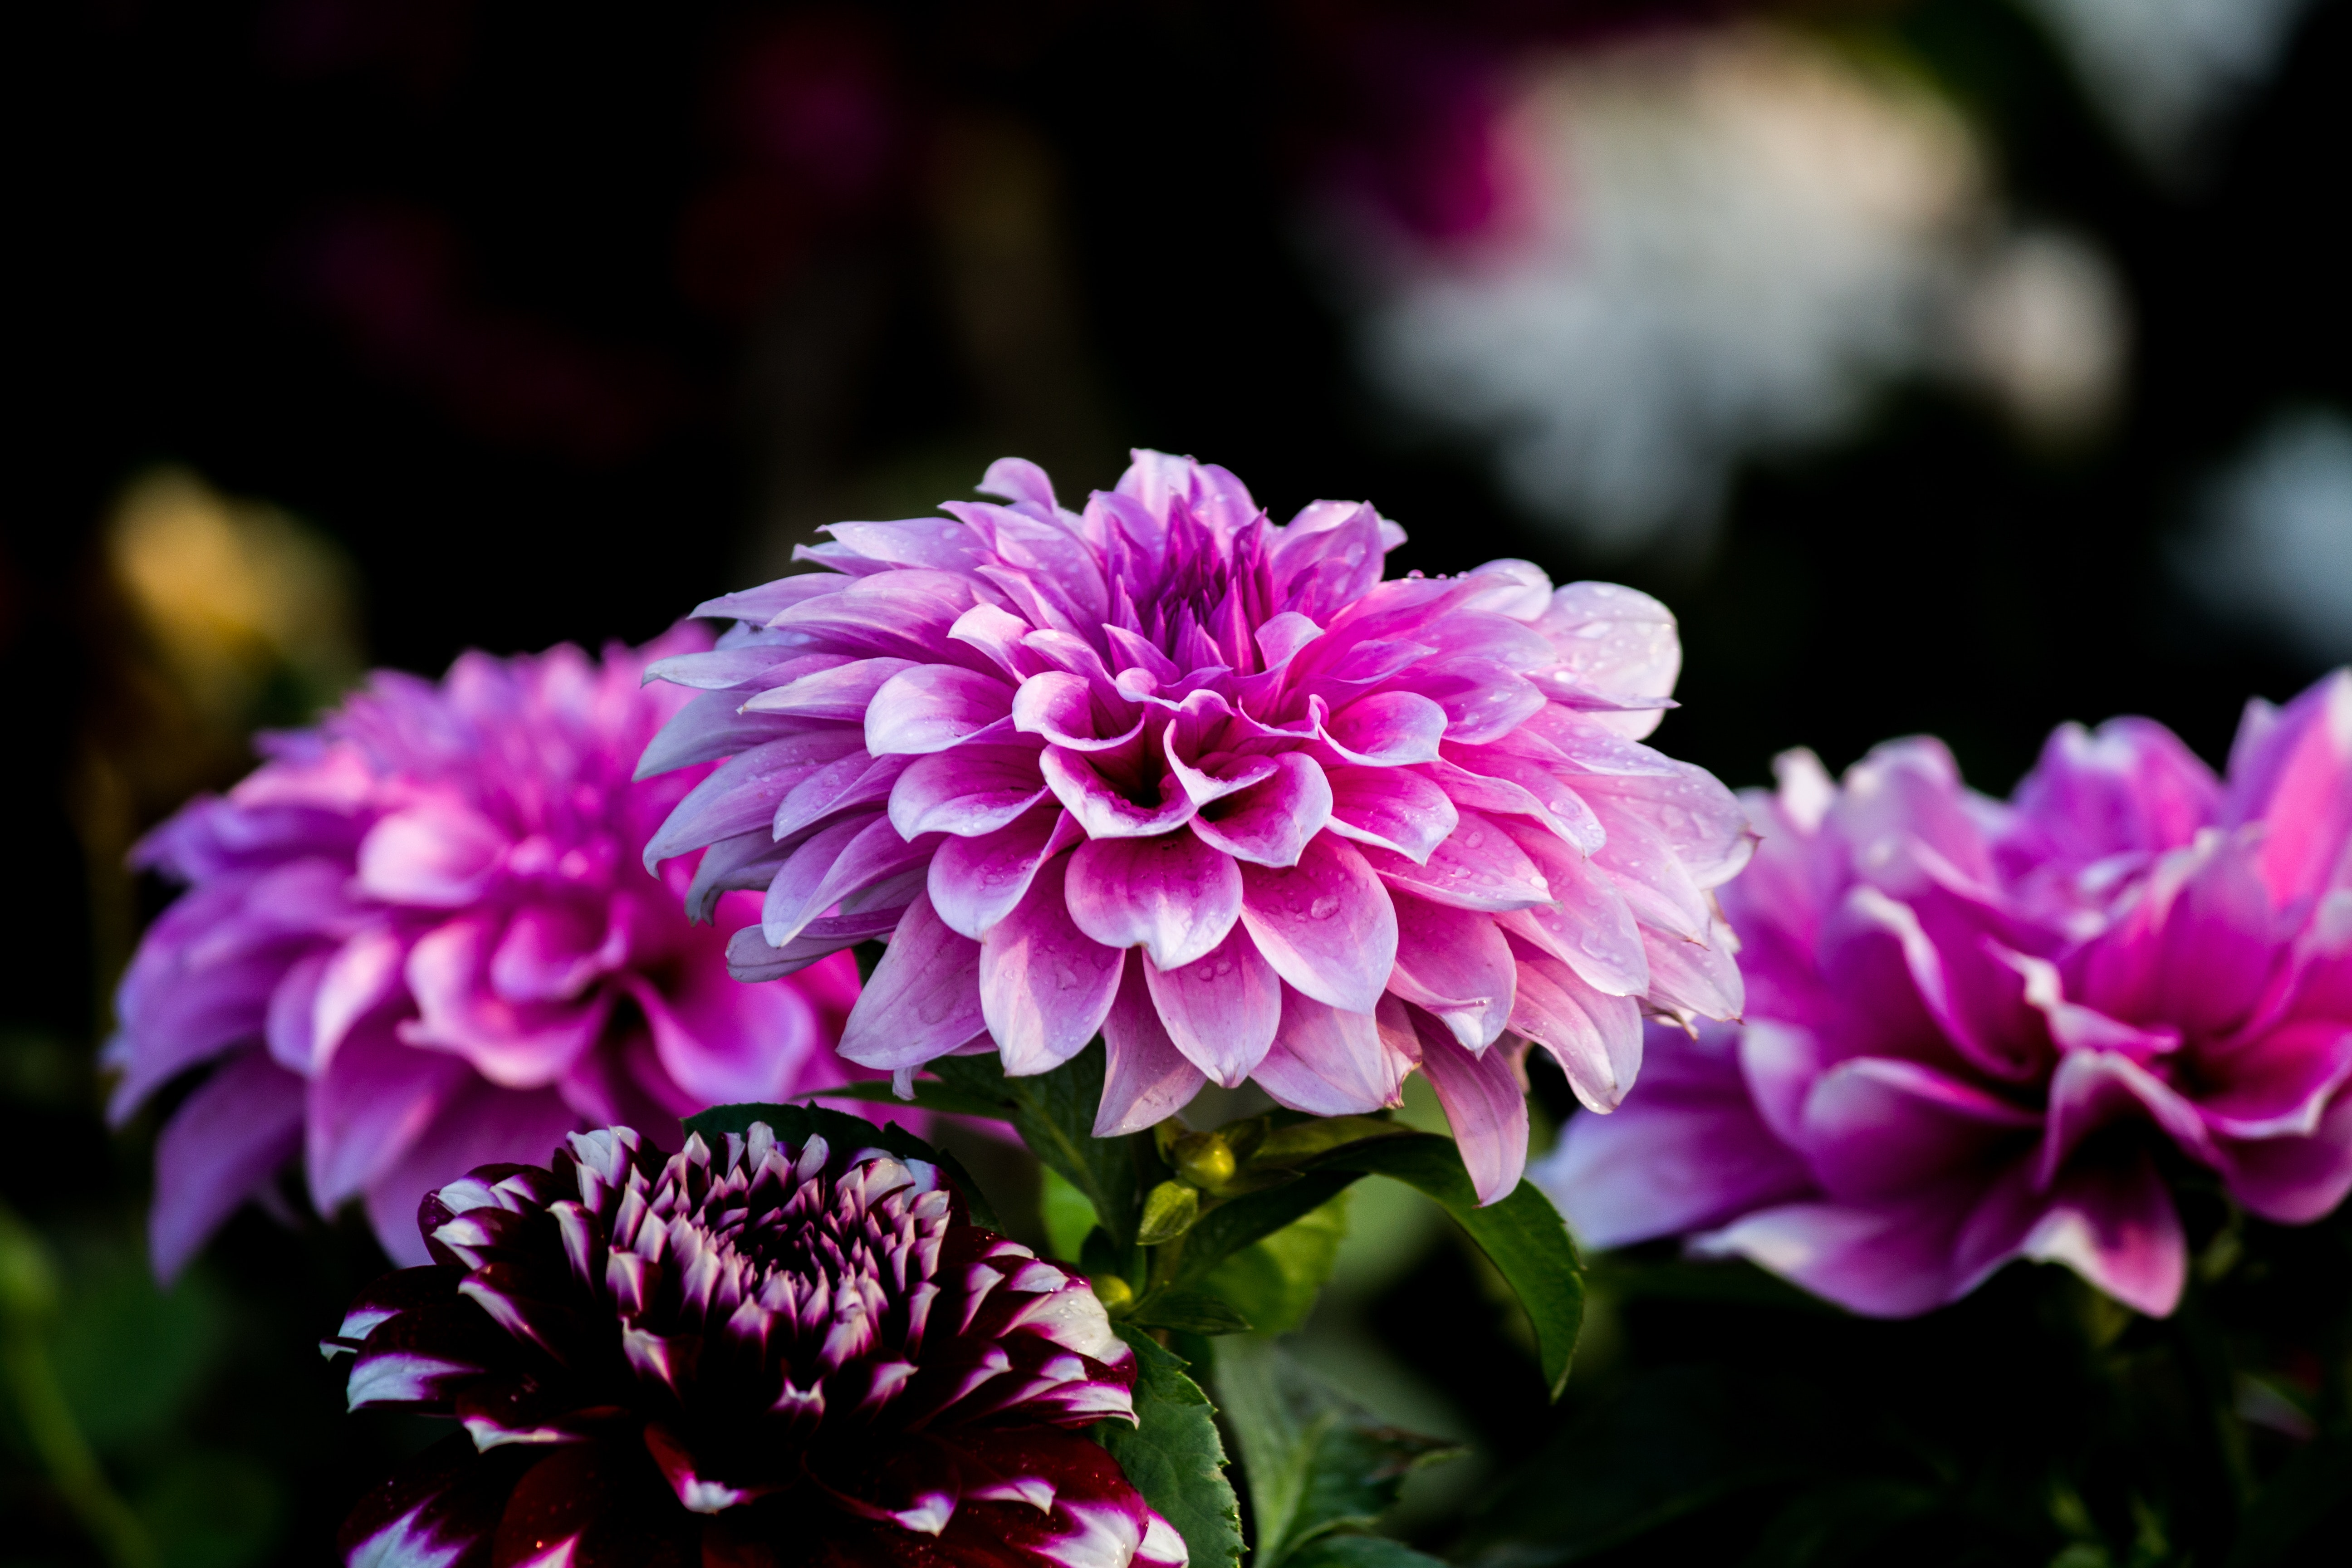 Purple Flower Wallpaper Free Stock Photo